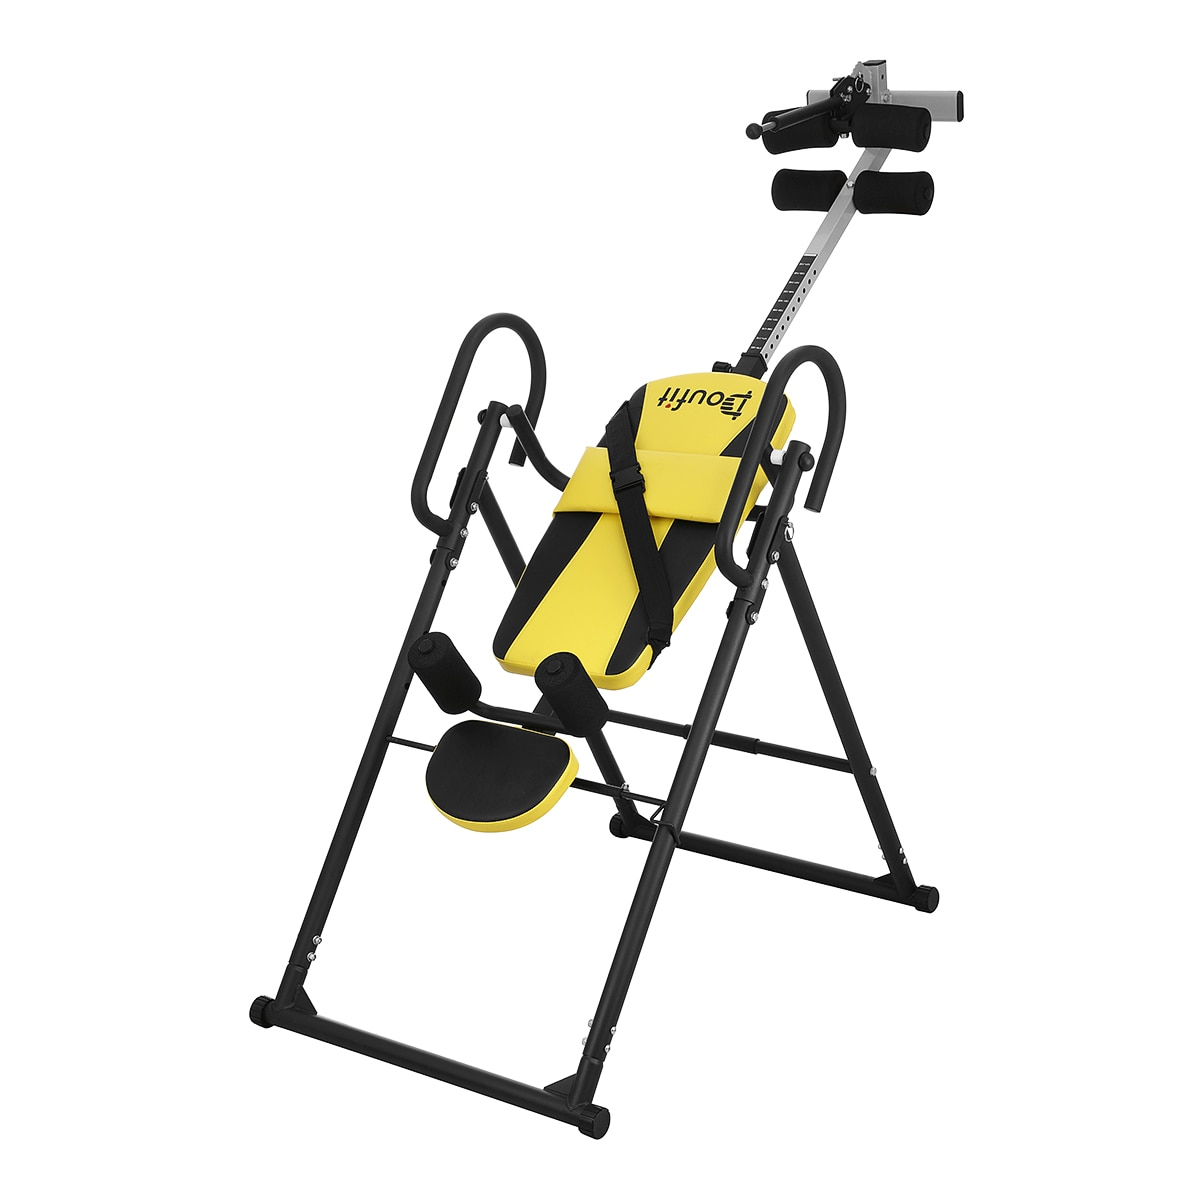 Doufit IT-03 136KG plegable Handstand máquina hogar plegable gimnasio Fitness equipo interior Headstand ejercicio Abdominal Trainer